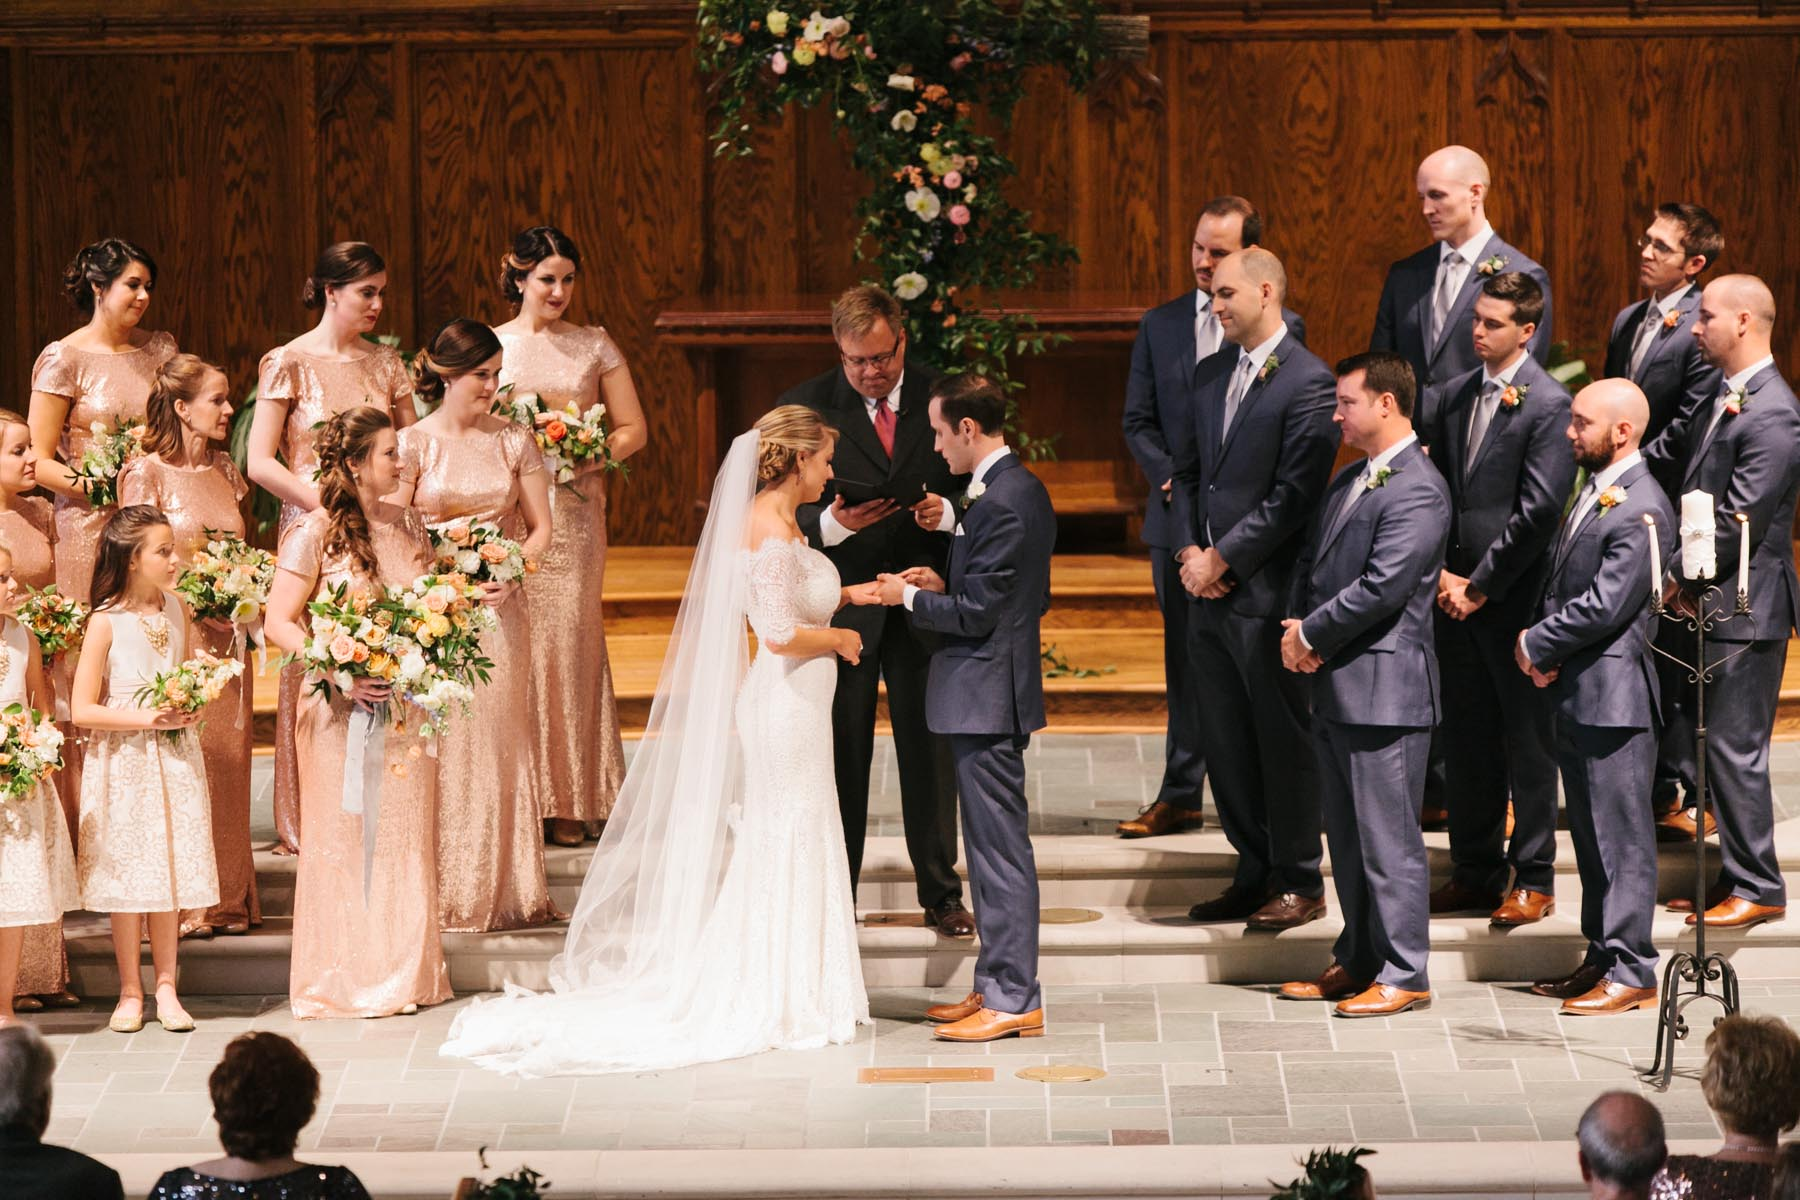 kjellman wedding blog biltmore wedding -80